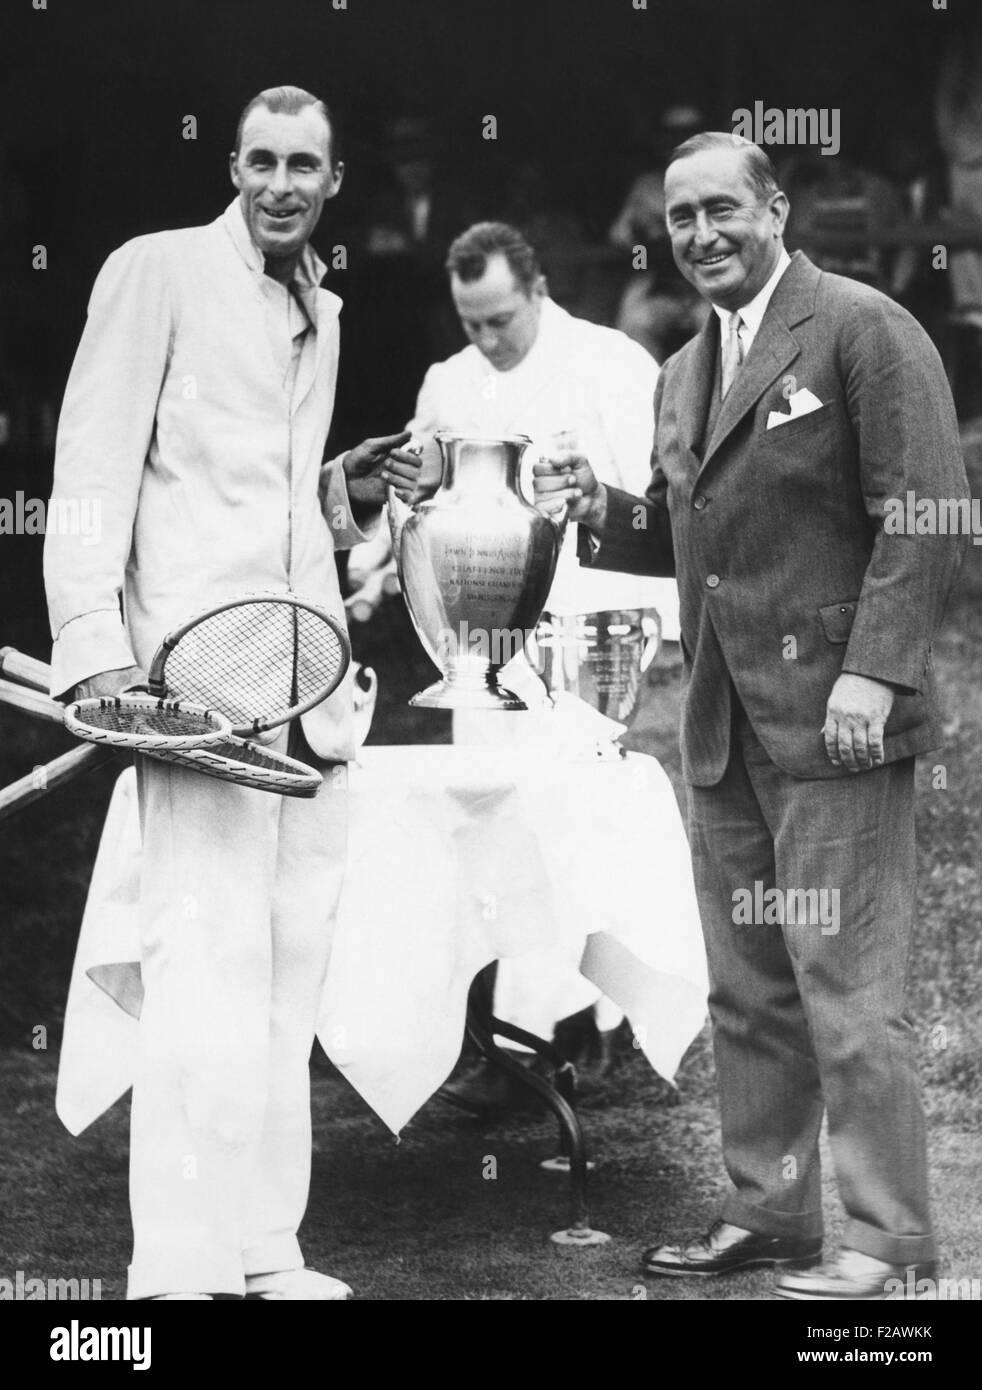 Bill Tilden receives trophy from Samuel Collum, after he won the Men's Singles Championship. Sept 15, 1929. Westside Stock Photo